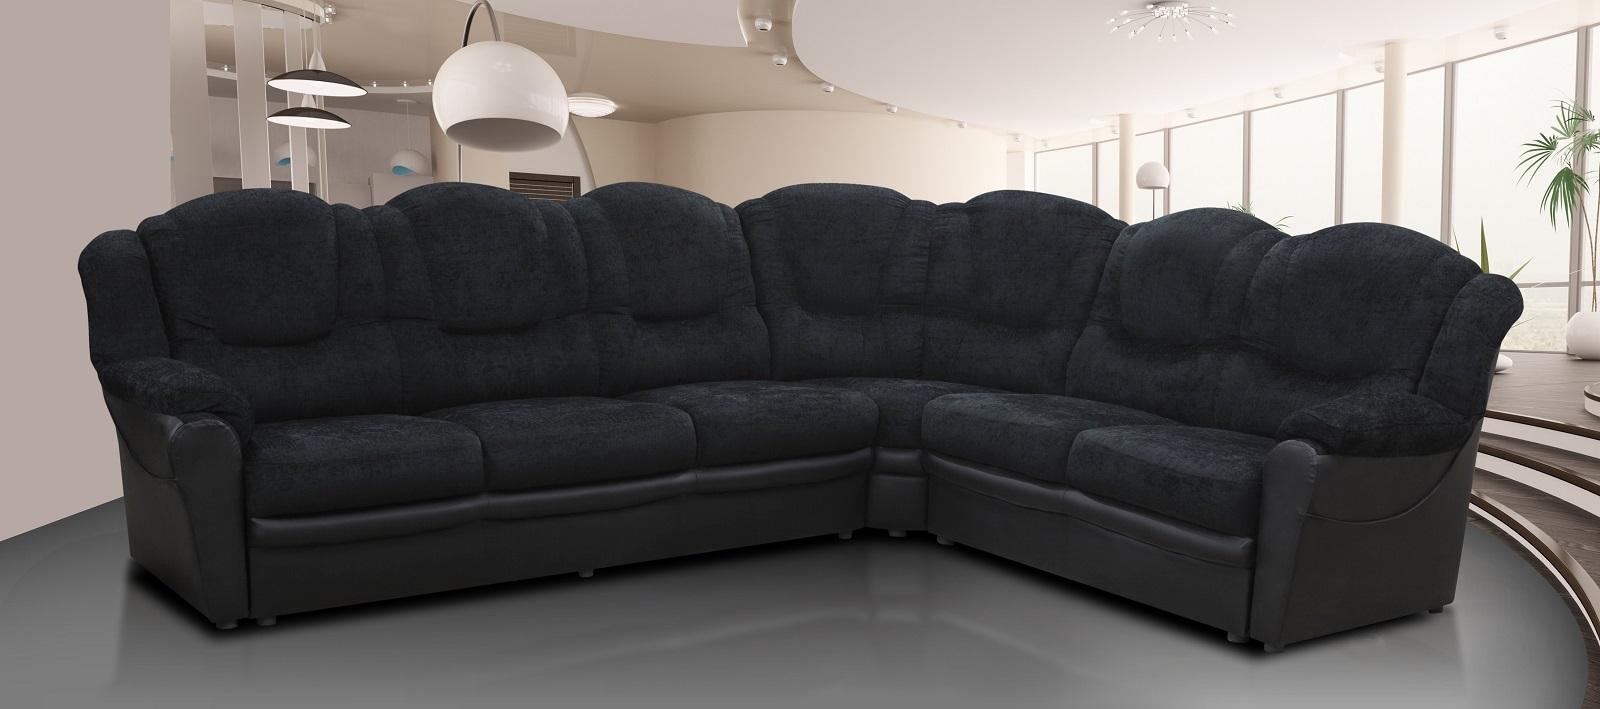 Texas Corner Sofa Black Fabric Amp Faux Leather